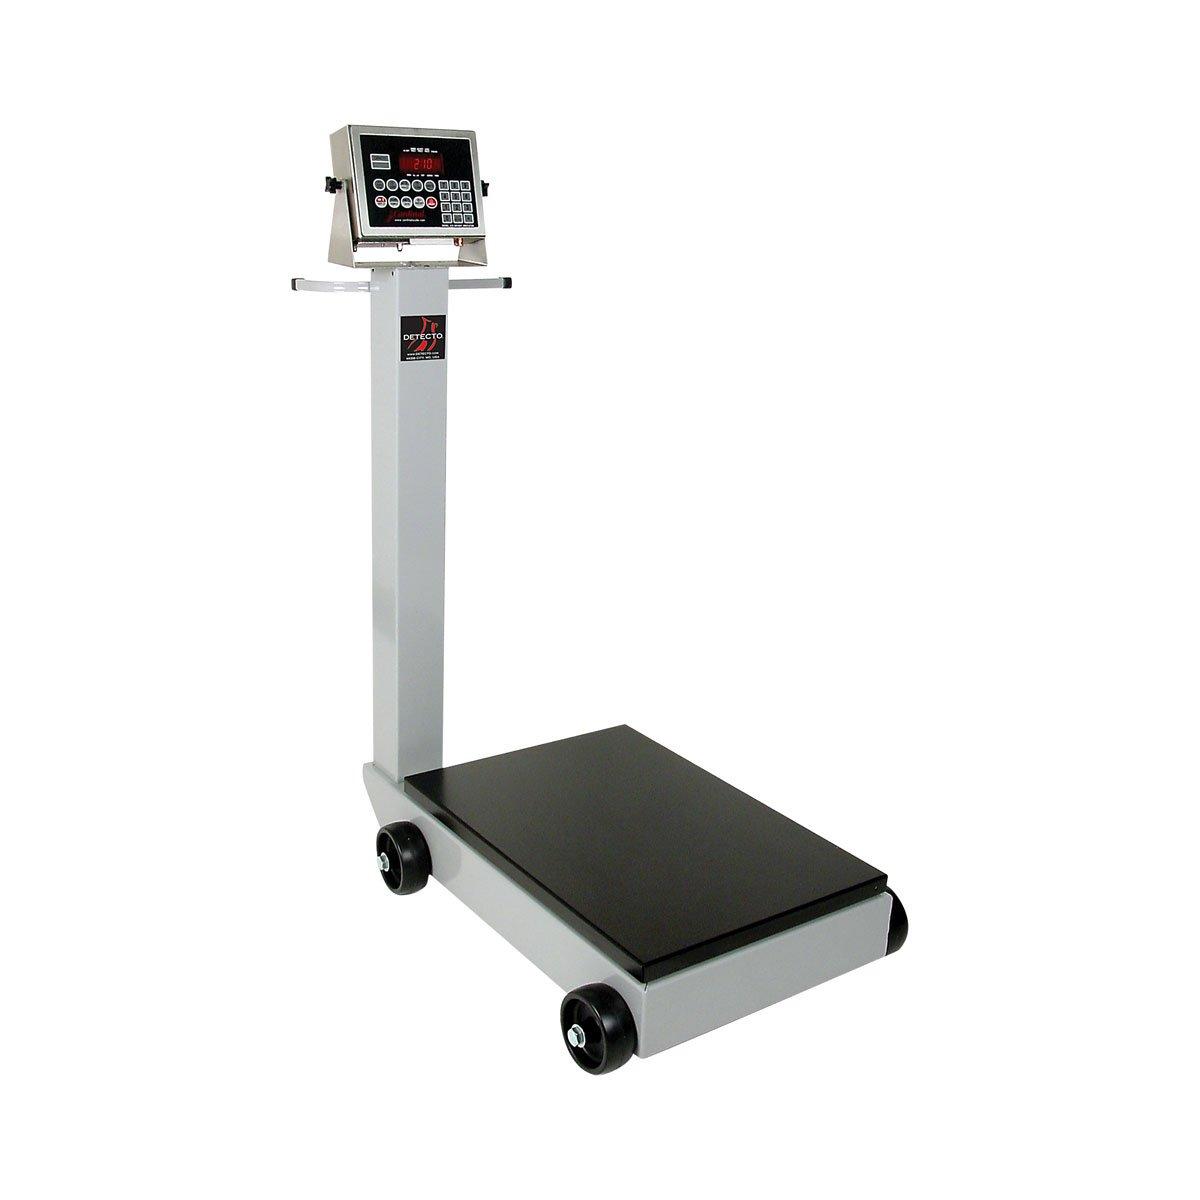 Detecto 5852F-204 Portable Digital Floor Scale, 500 lb. Capacity, 204 Indicator